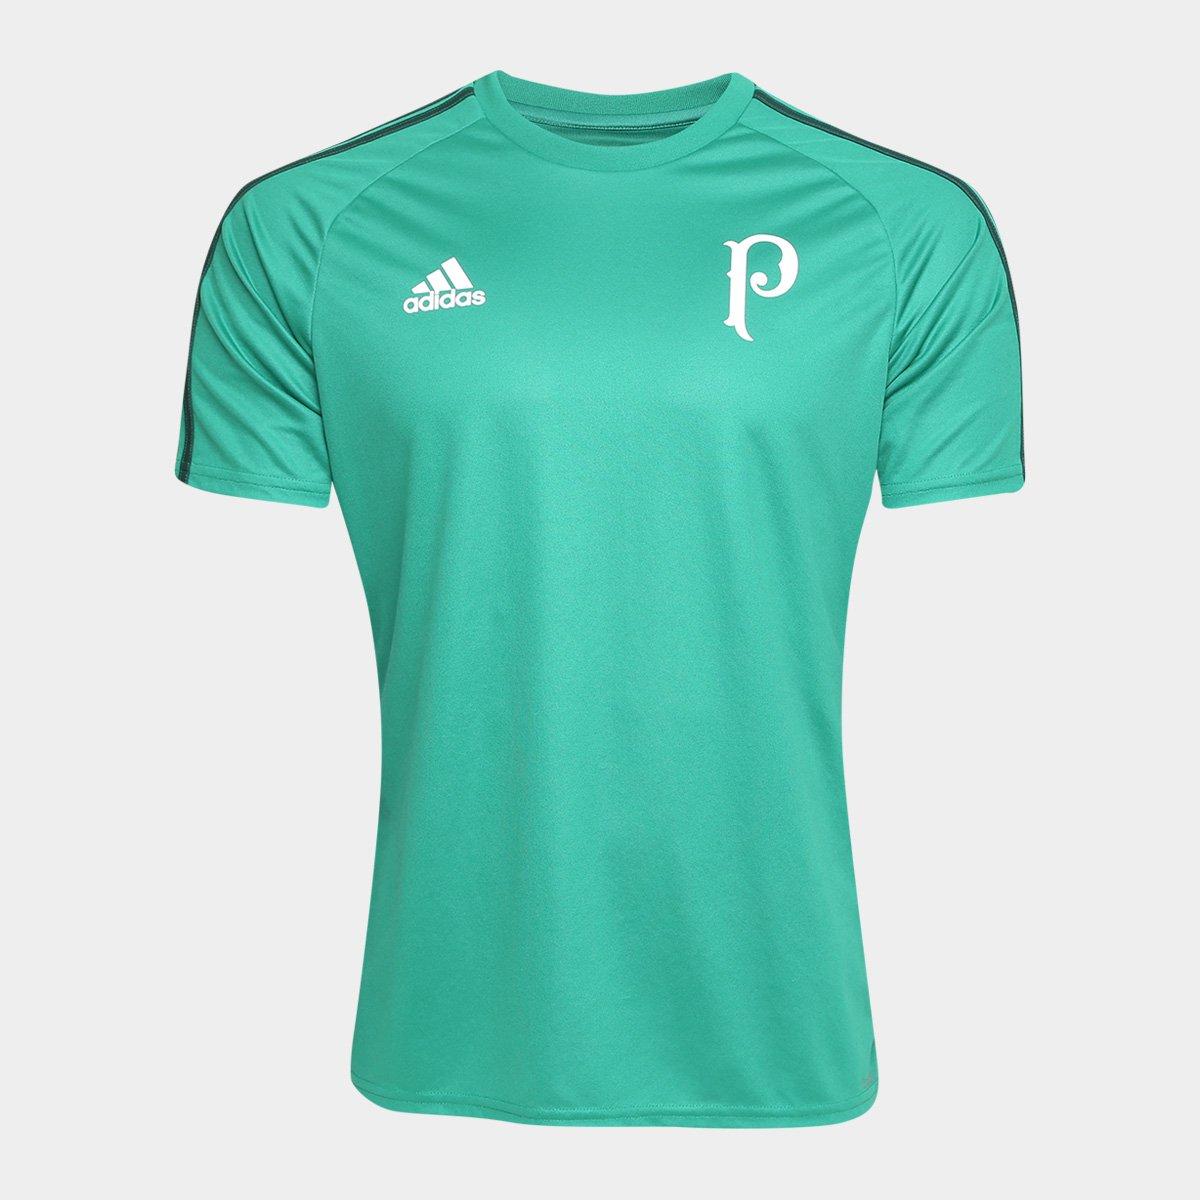 4a4c6d95f Camisa Palmeiras Réplica 17/18 s/nº Adidas Masculina | Allianz Parque Shop